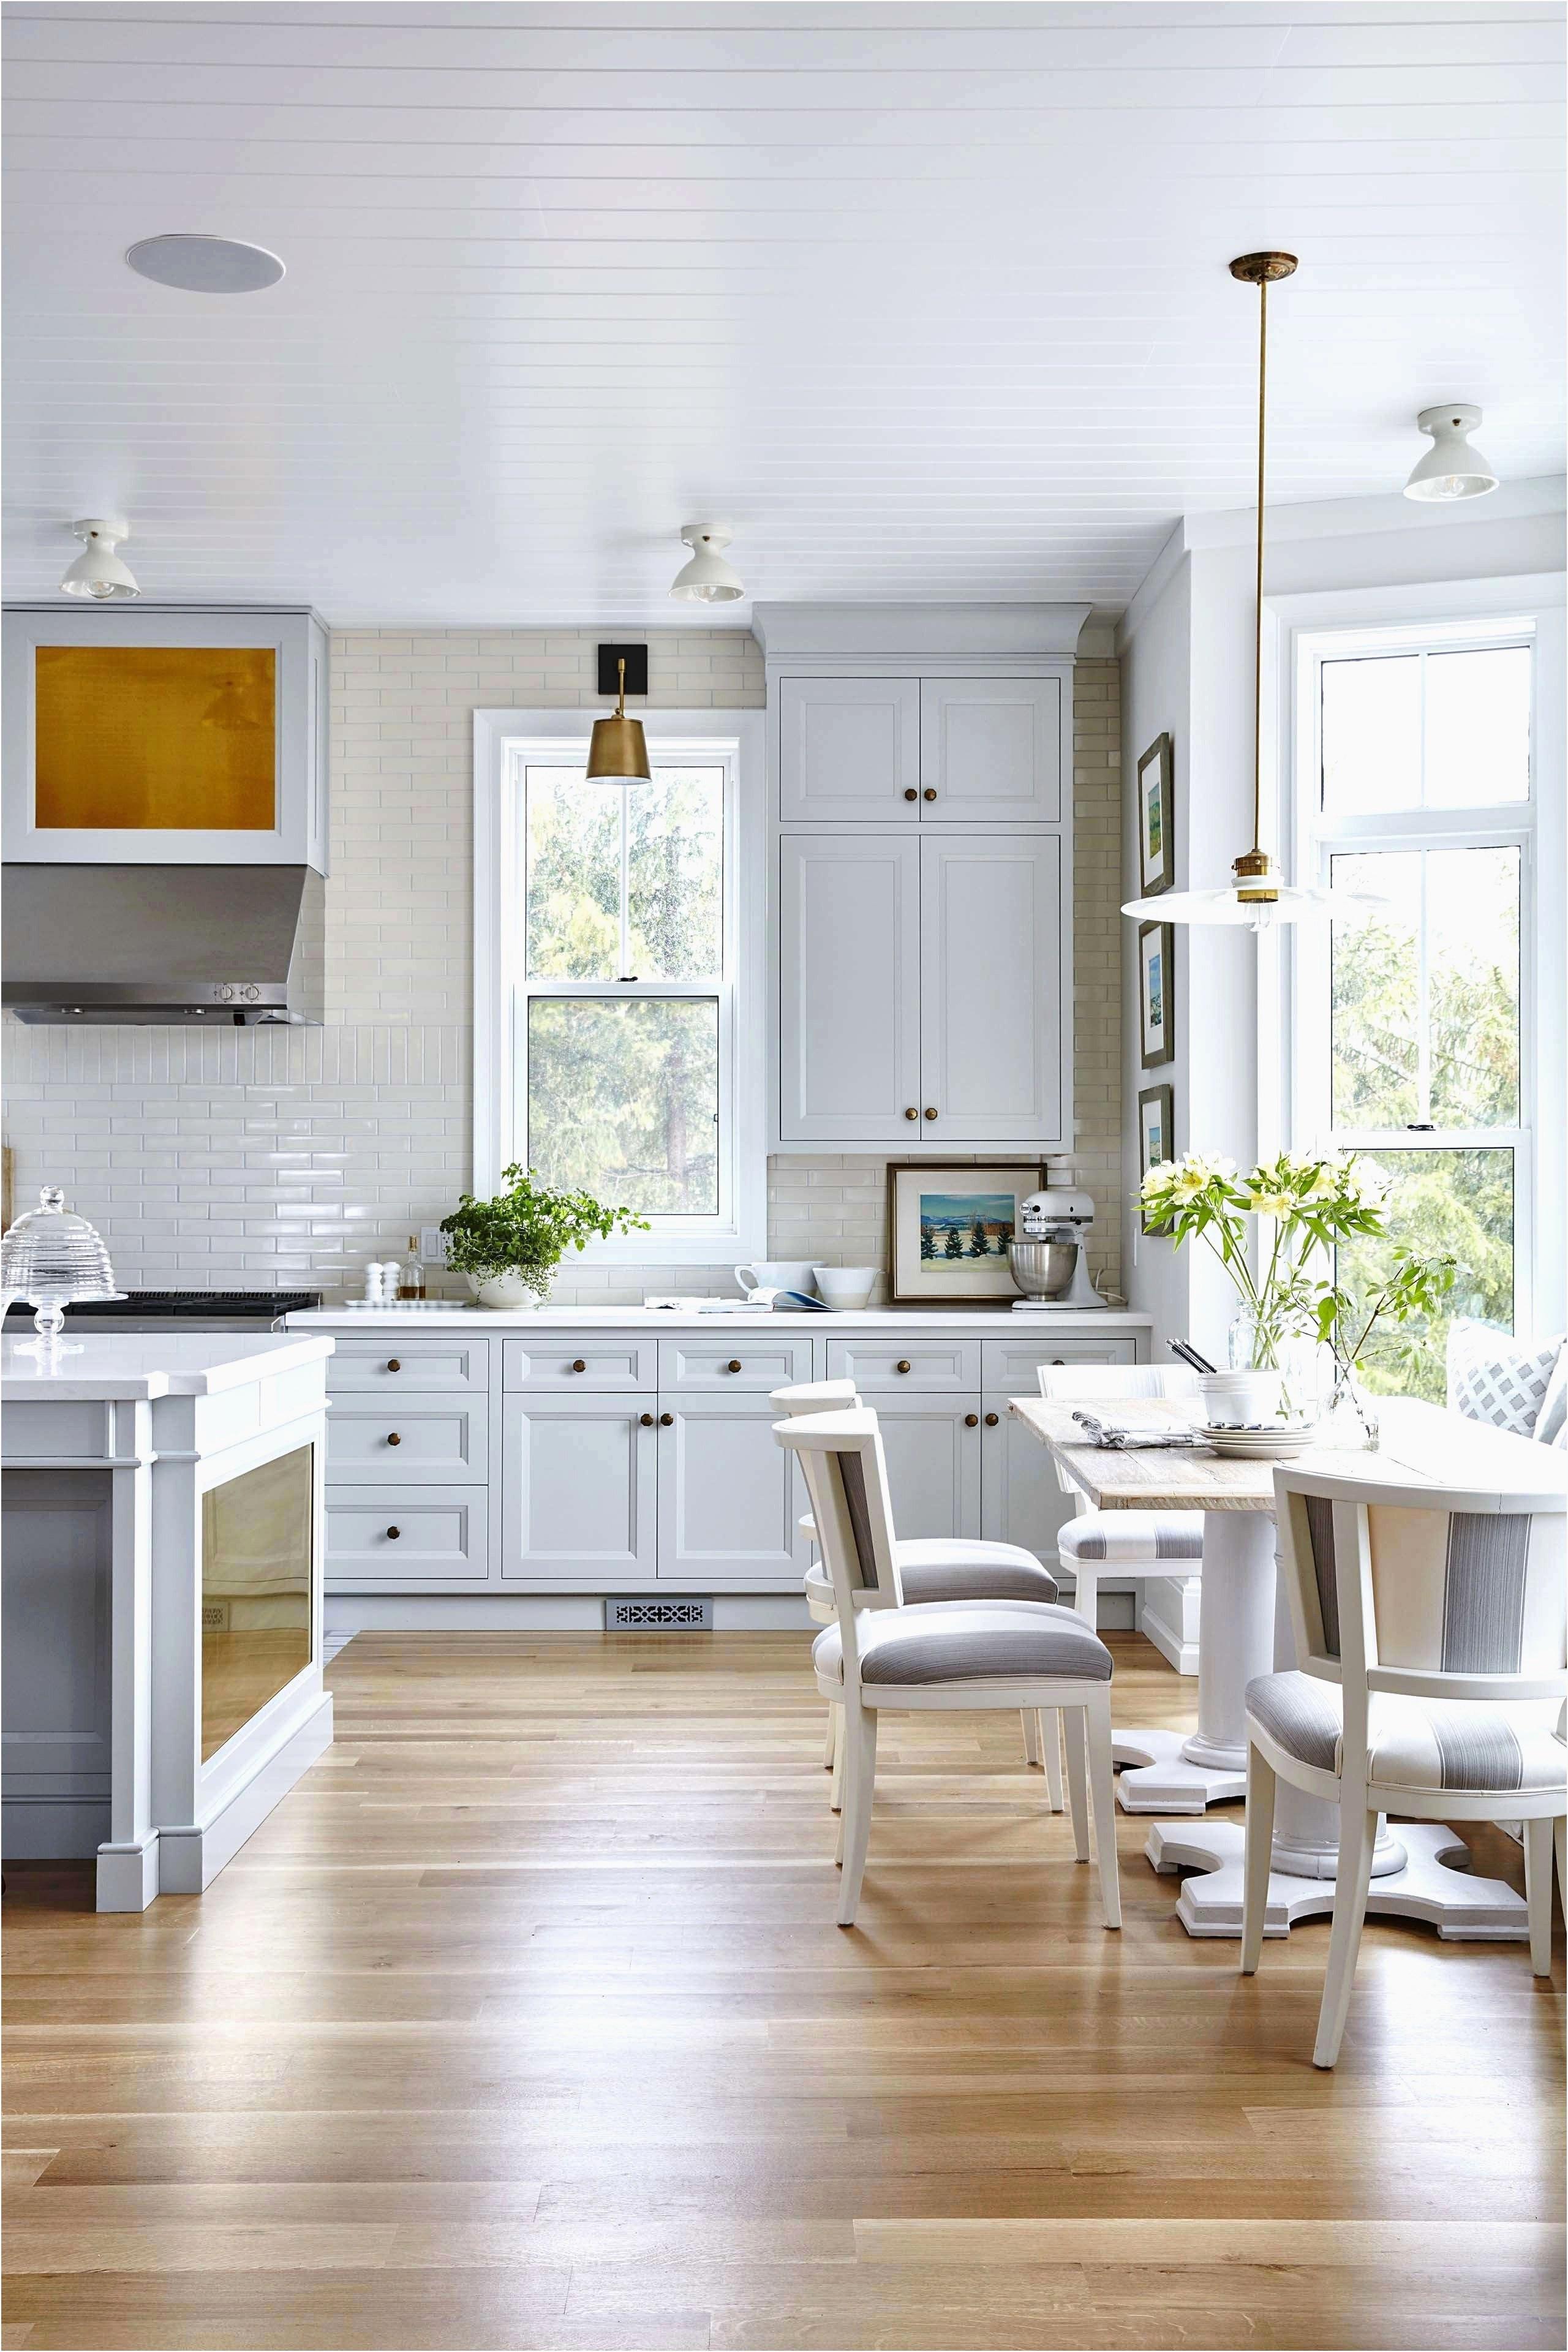 modern hardwood flooring ideas of wood tile kitchen latest kitchen designs s fresh tiles in kitchen throughout how to start laminate flooring luxury kitchen joys kitchen joys kitchen 0d kitchens design ideas